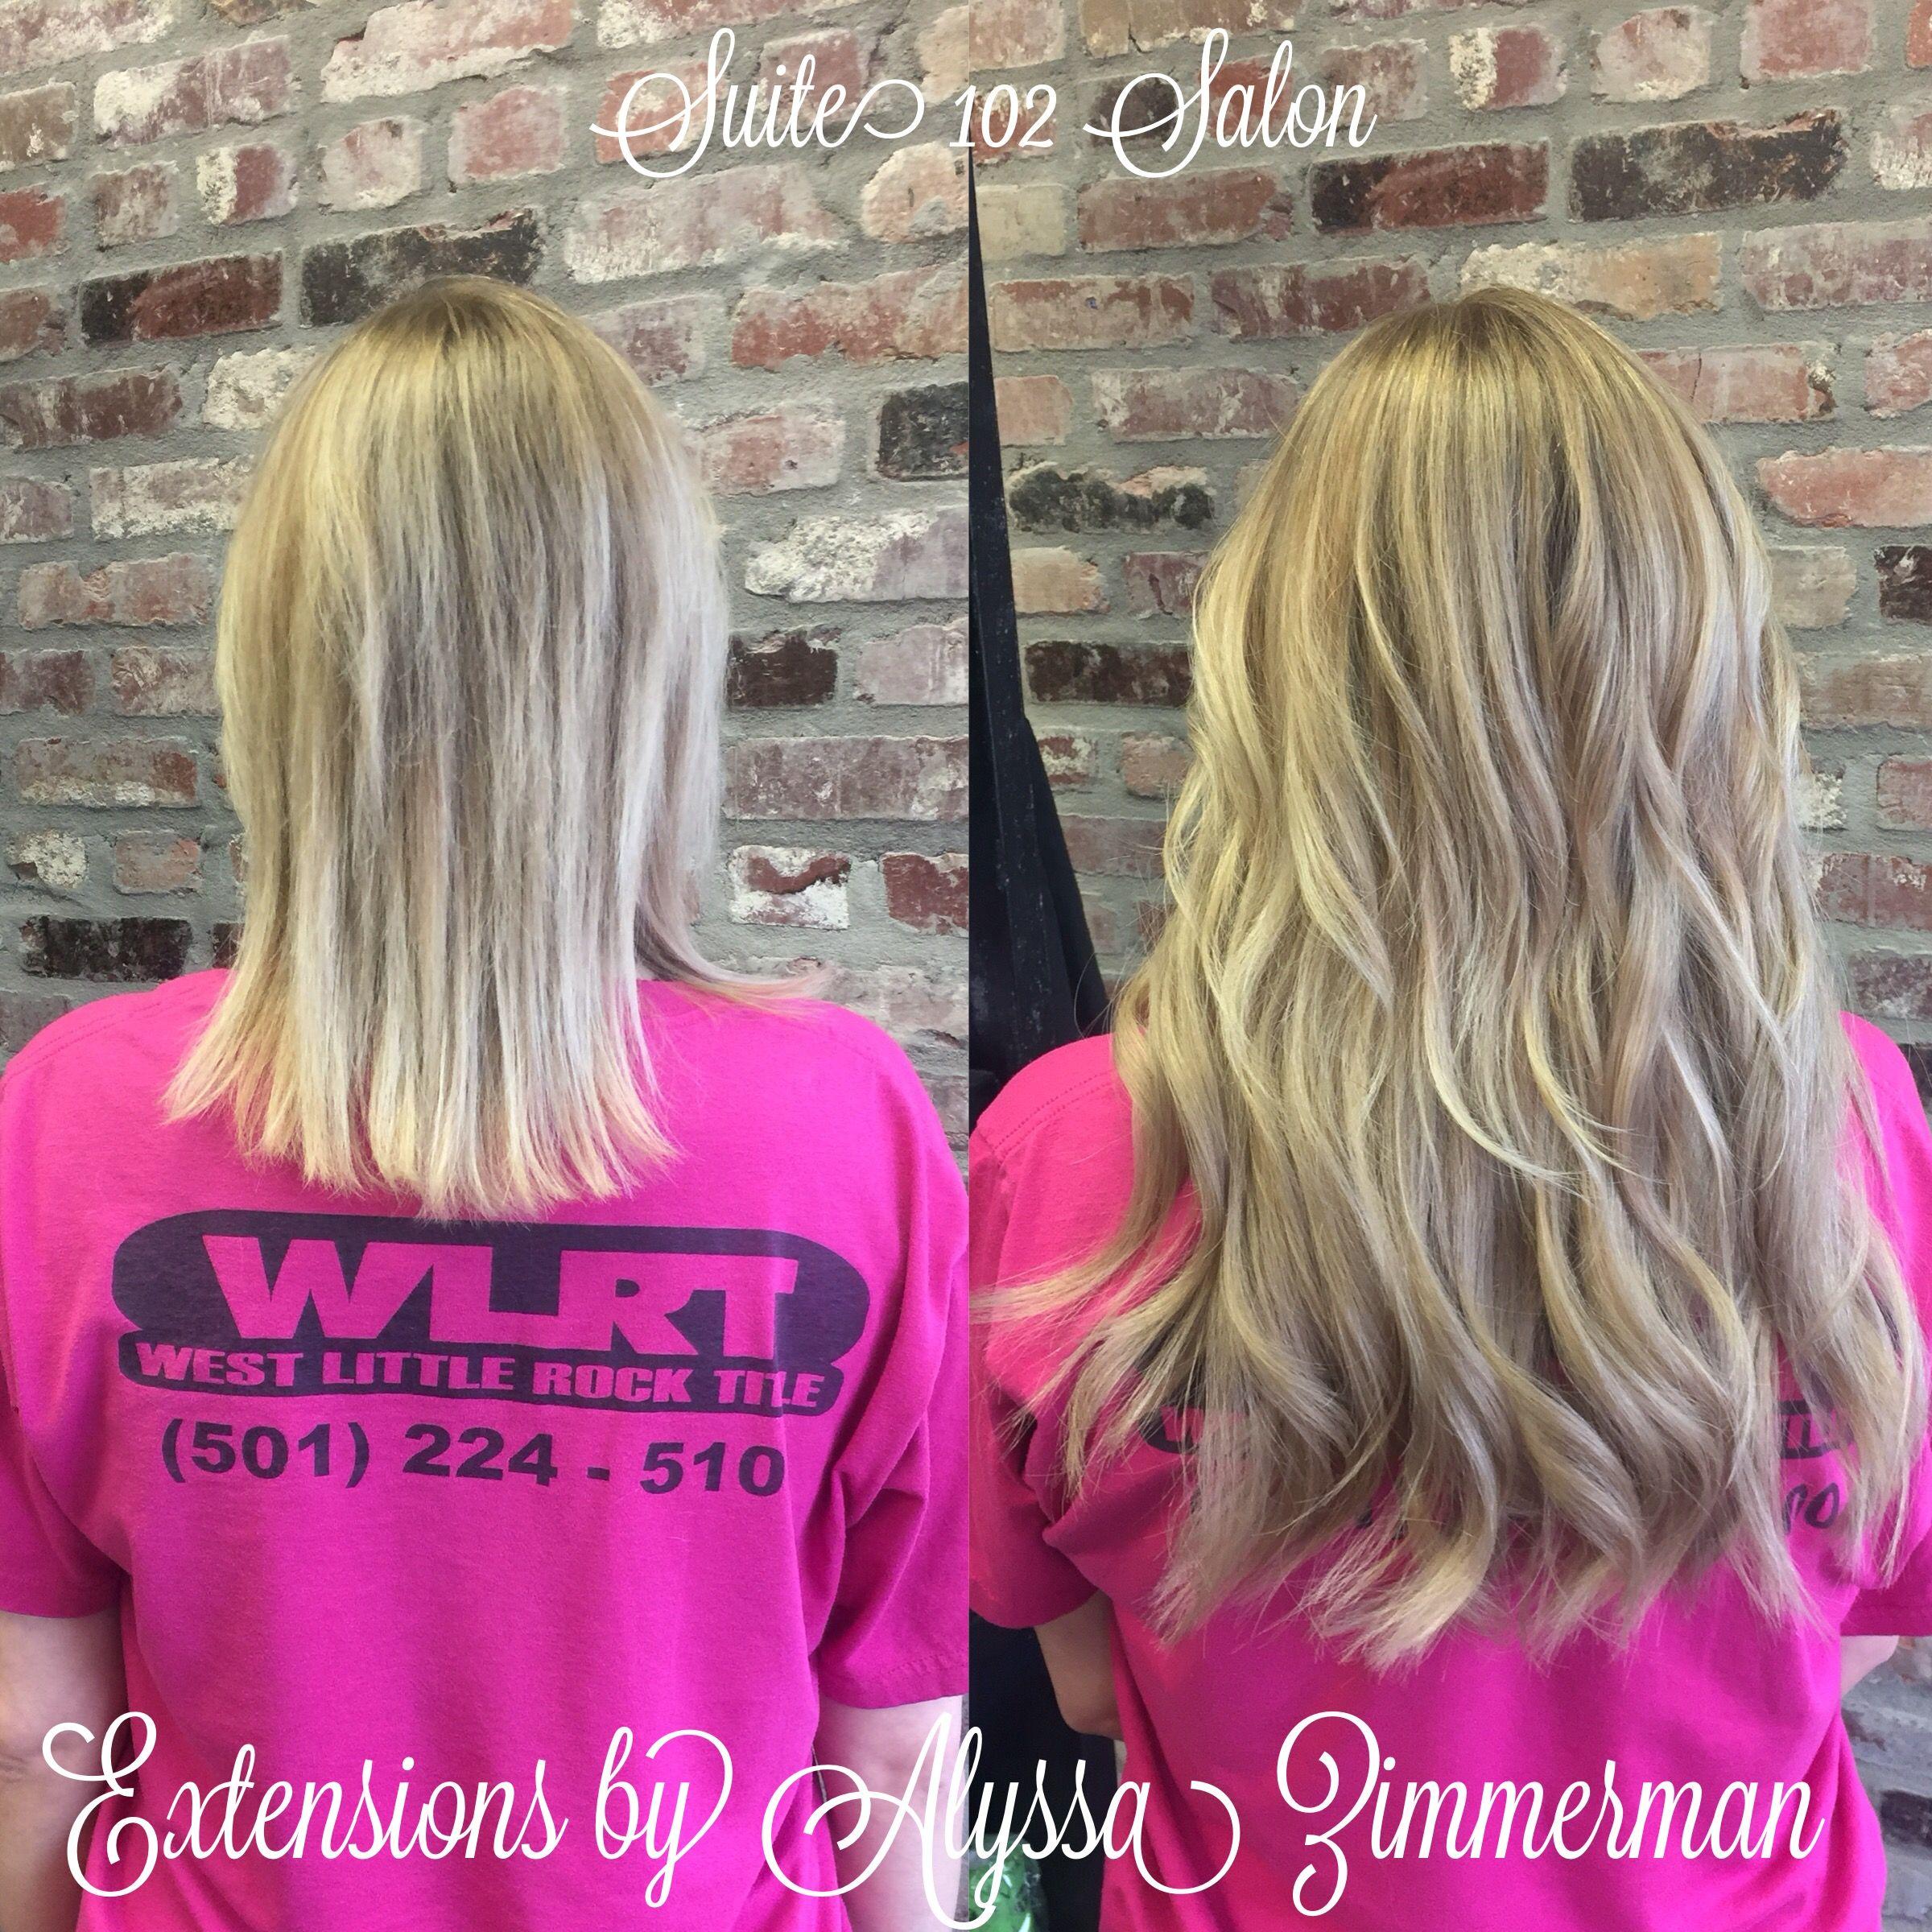 Hair Extensions Little Rock Arkansas Alyssa Zimmerman Suite 102